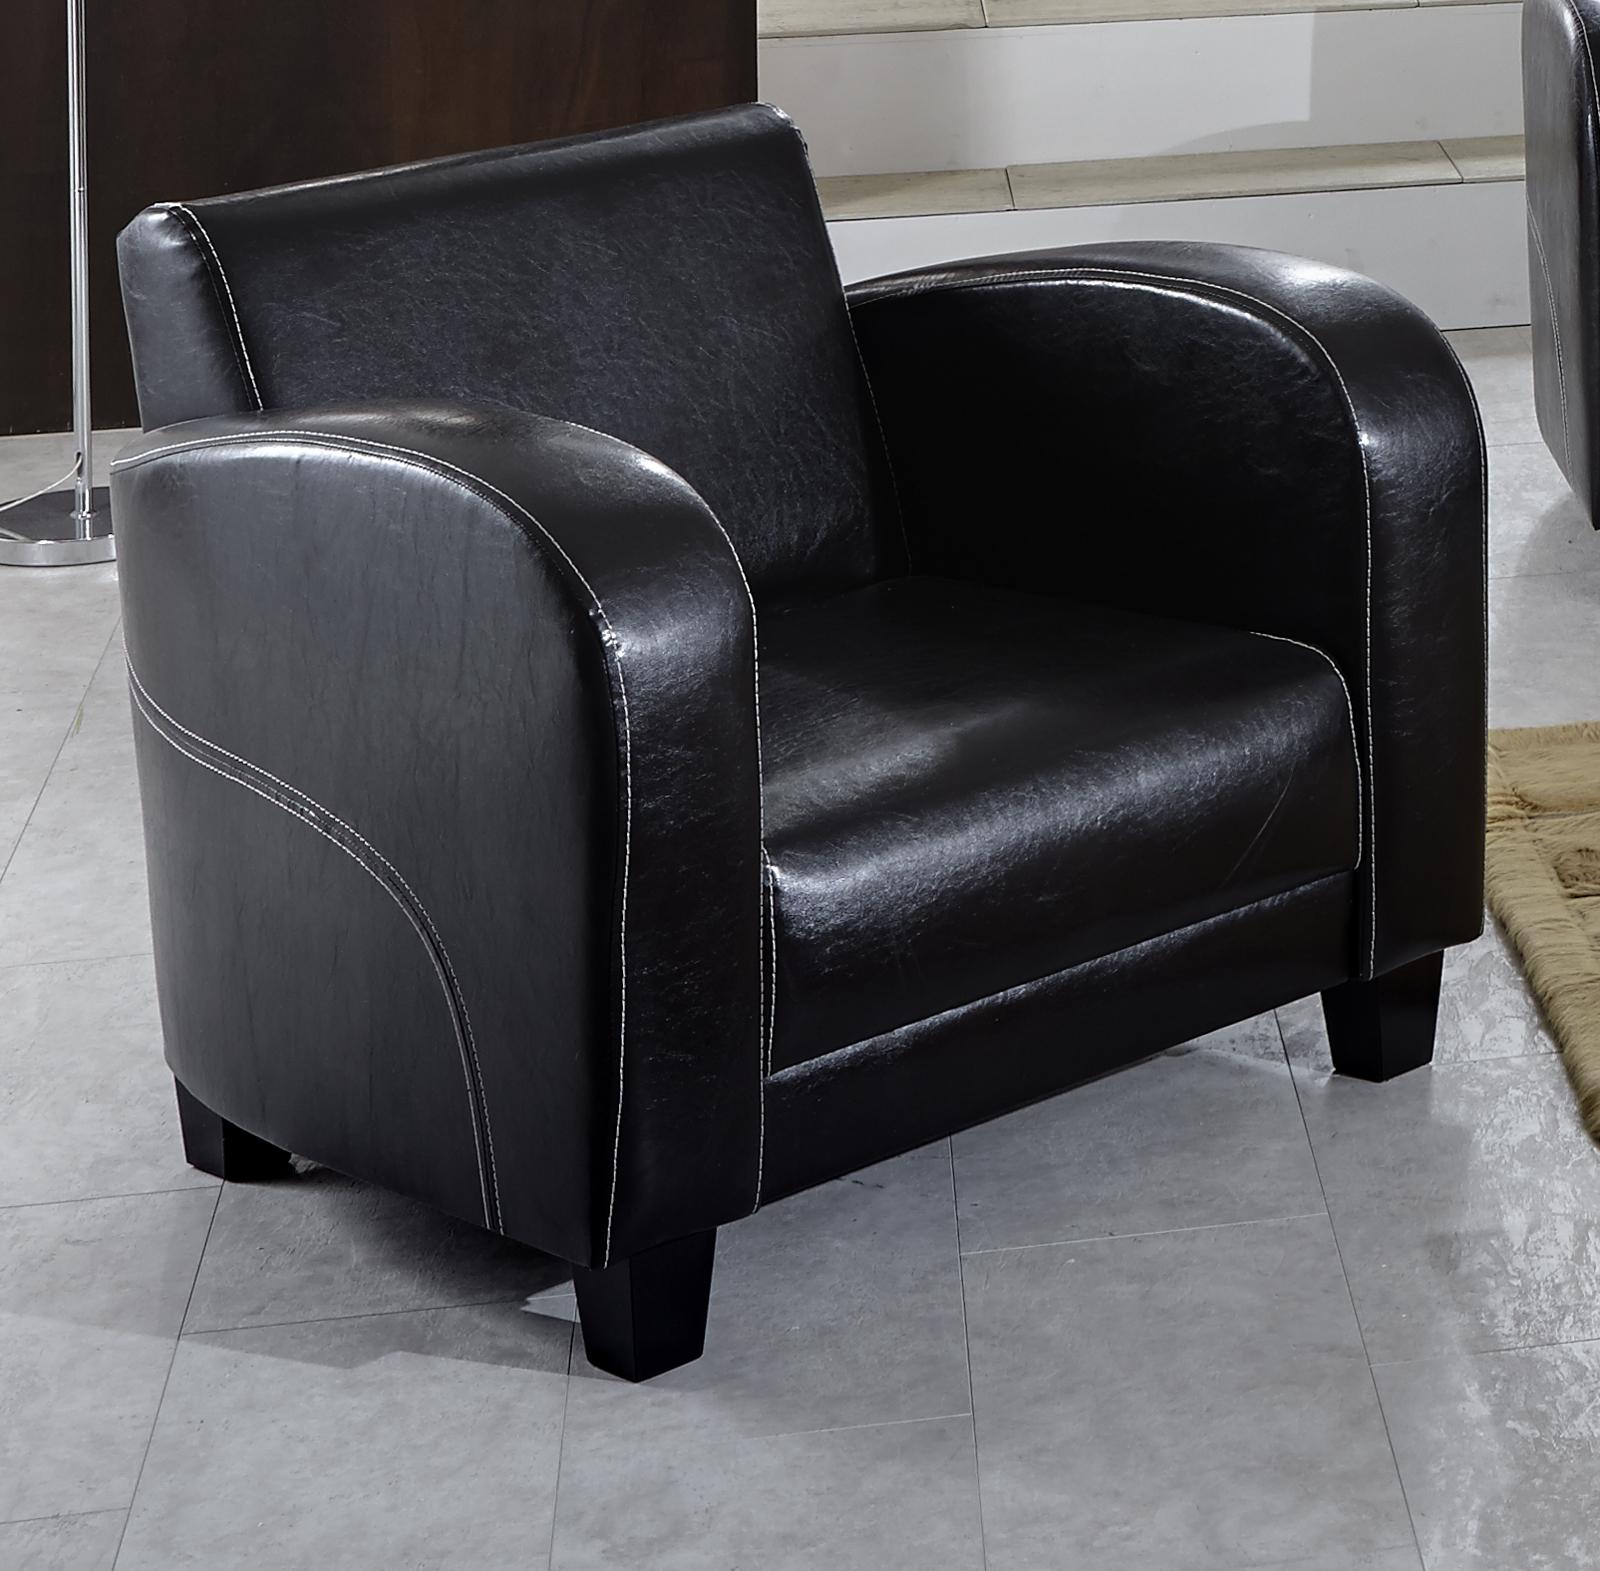 sam 3tlg sofa garnitur antik braun patryk 3 2 1. Black Bedroom Furniture Sets. Home Design Ideas